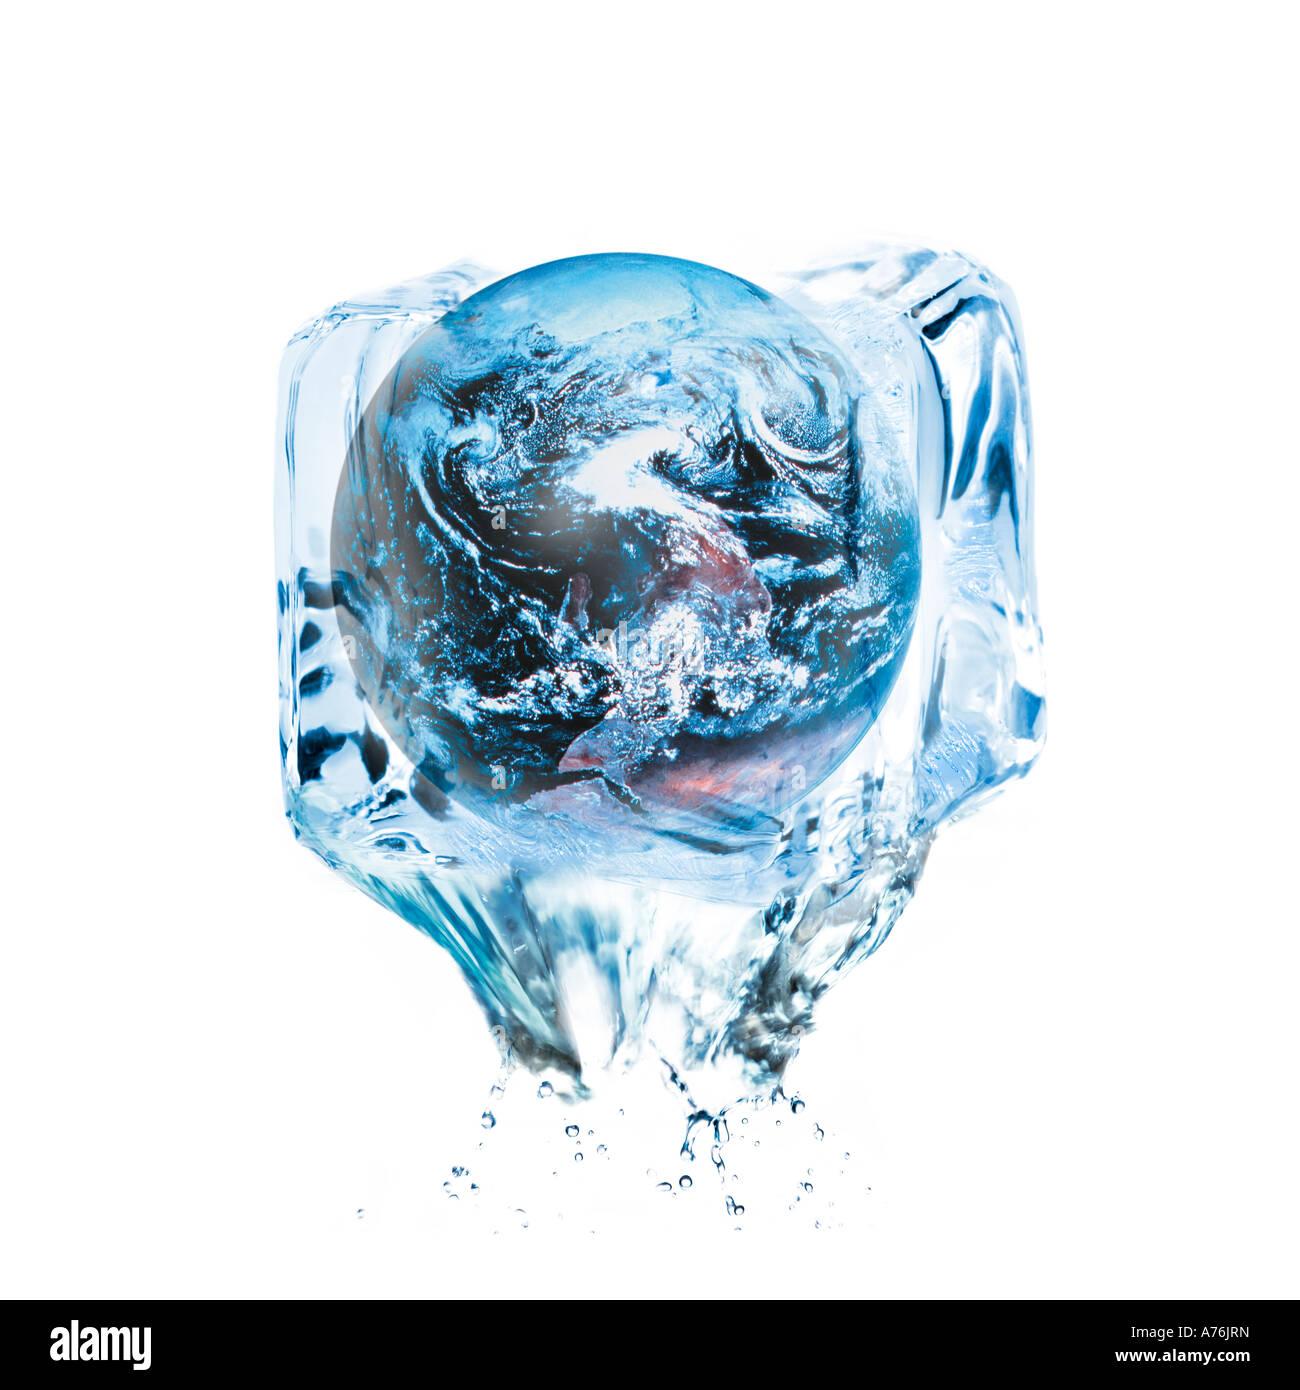 Symbol for global warming digital composite stock photo 11741240 symbol for global warming digital composite buycottarizona Image collections